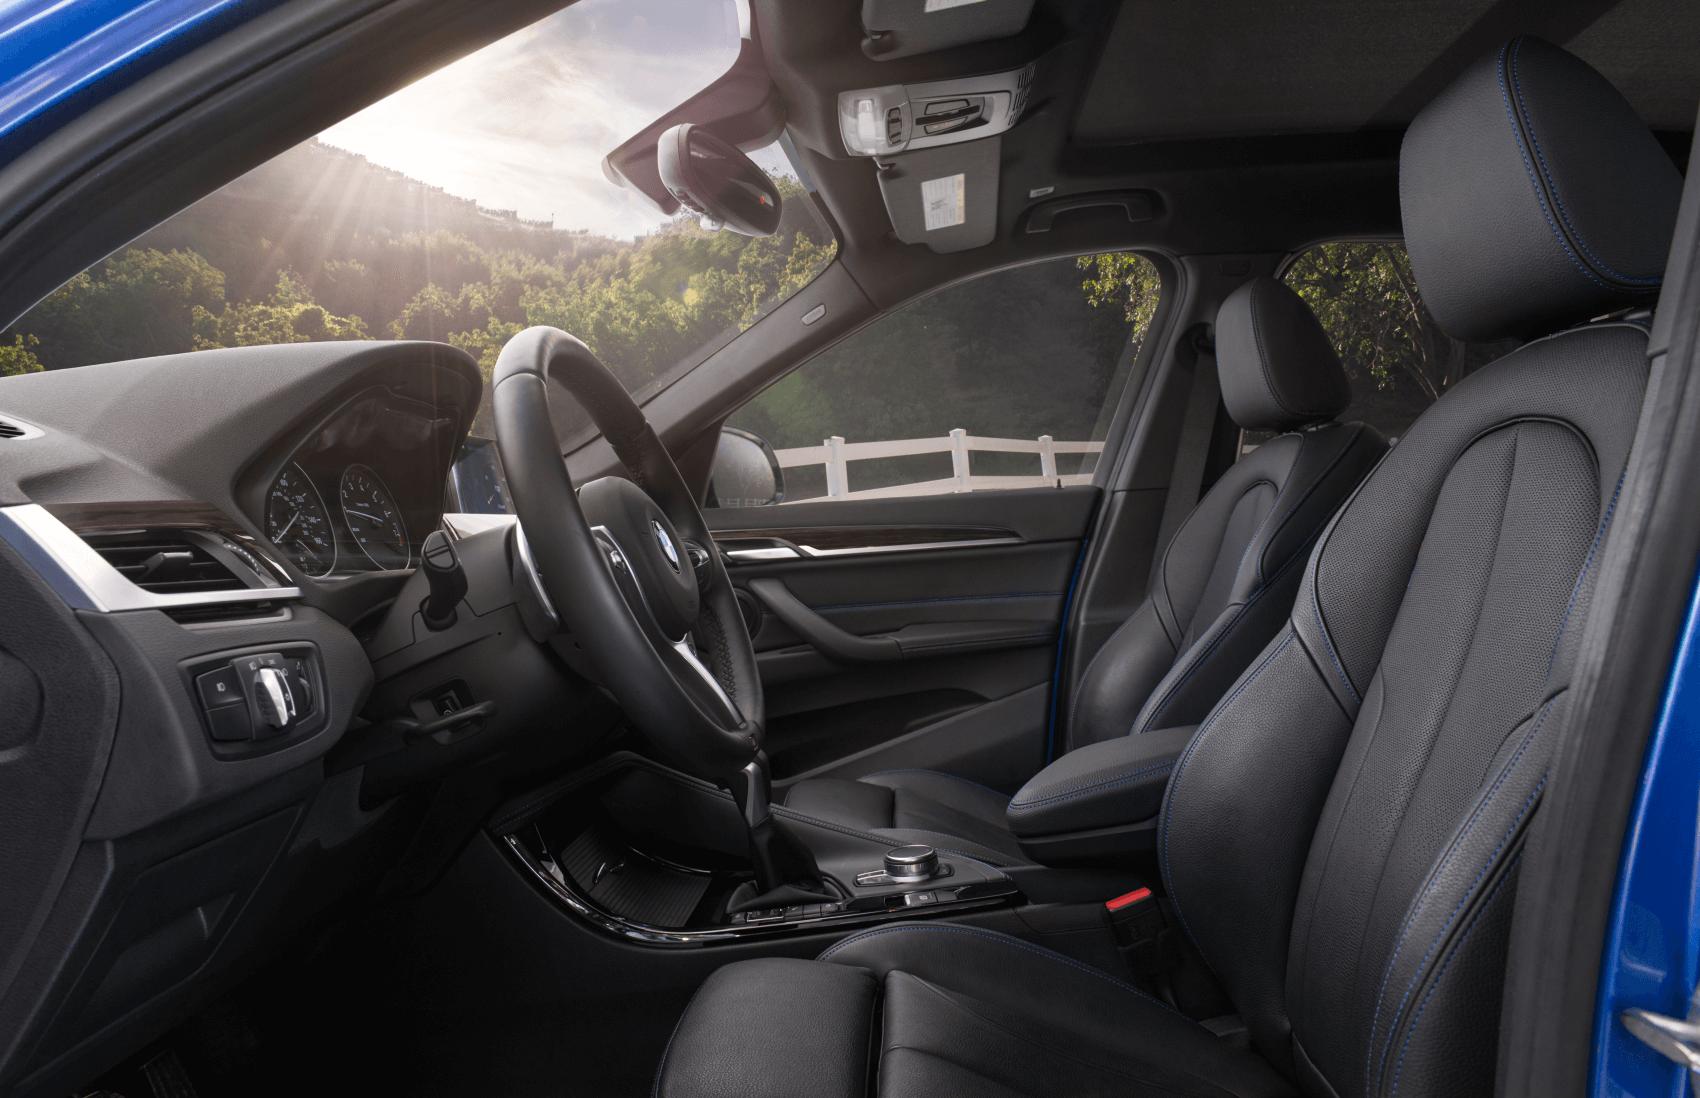 BMW X1 Interior Seating